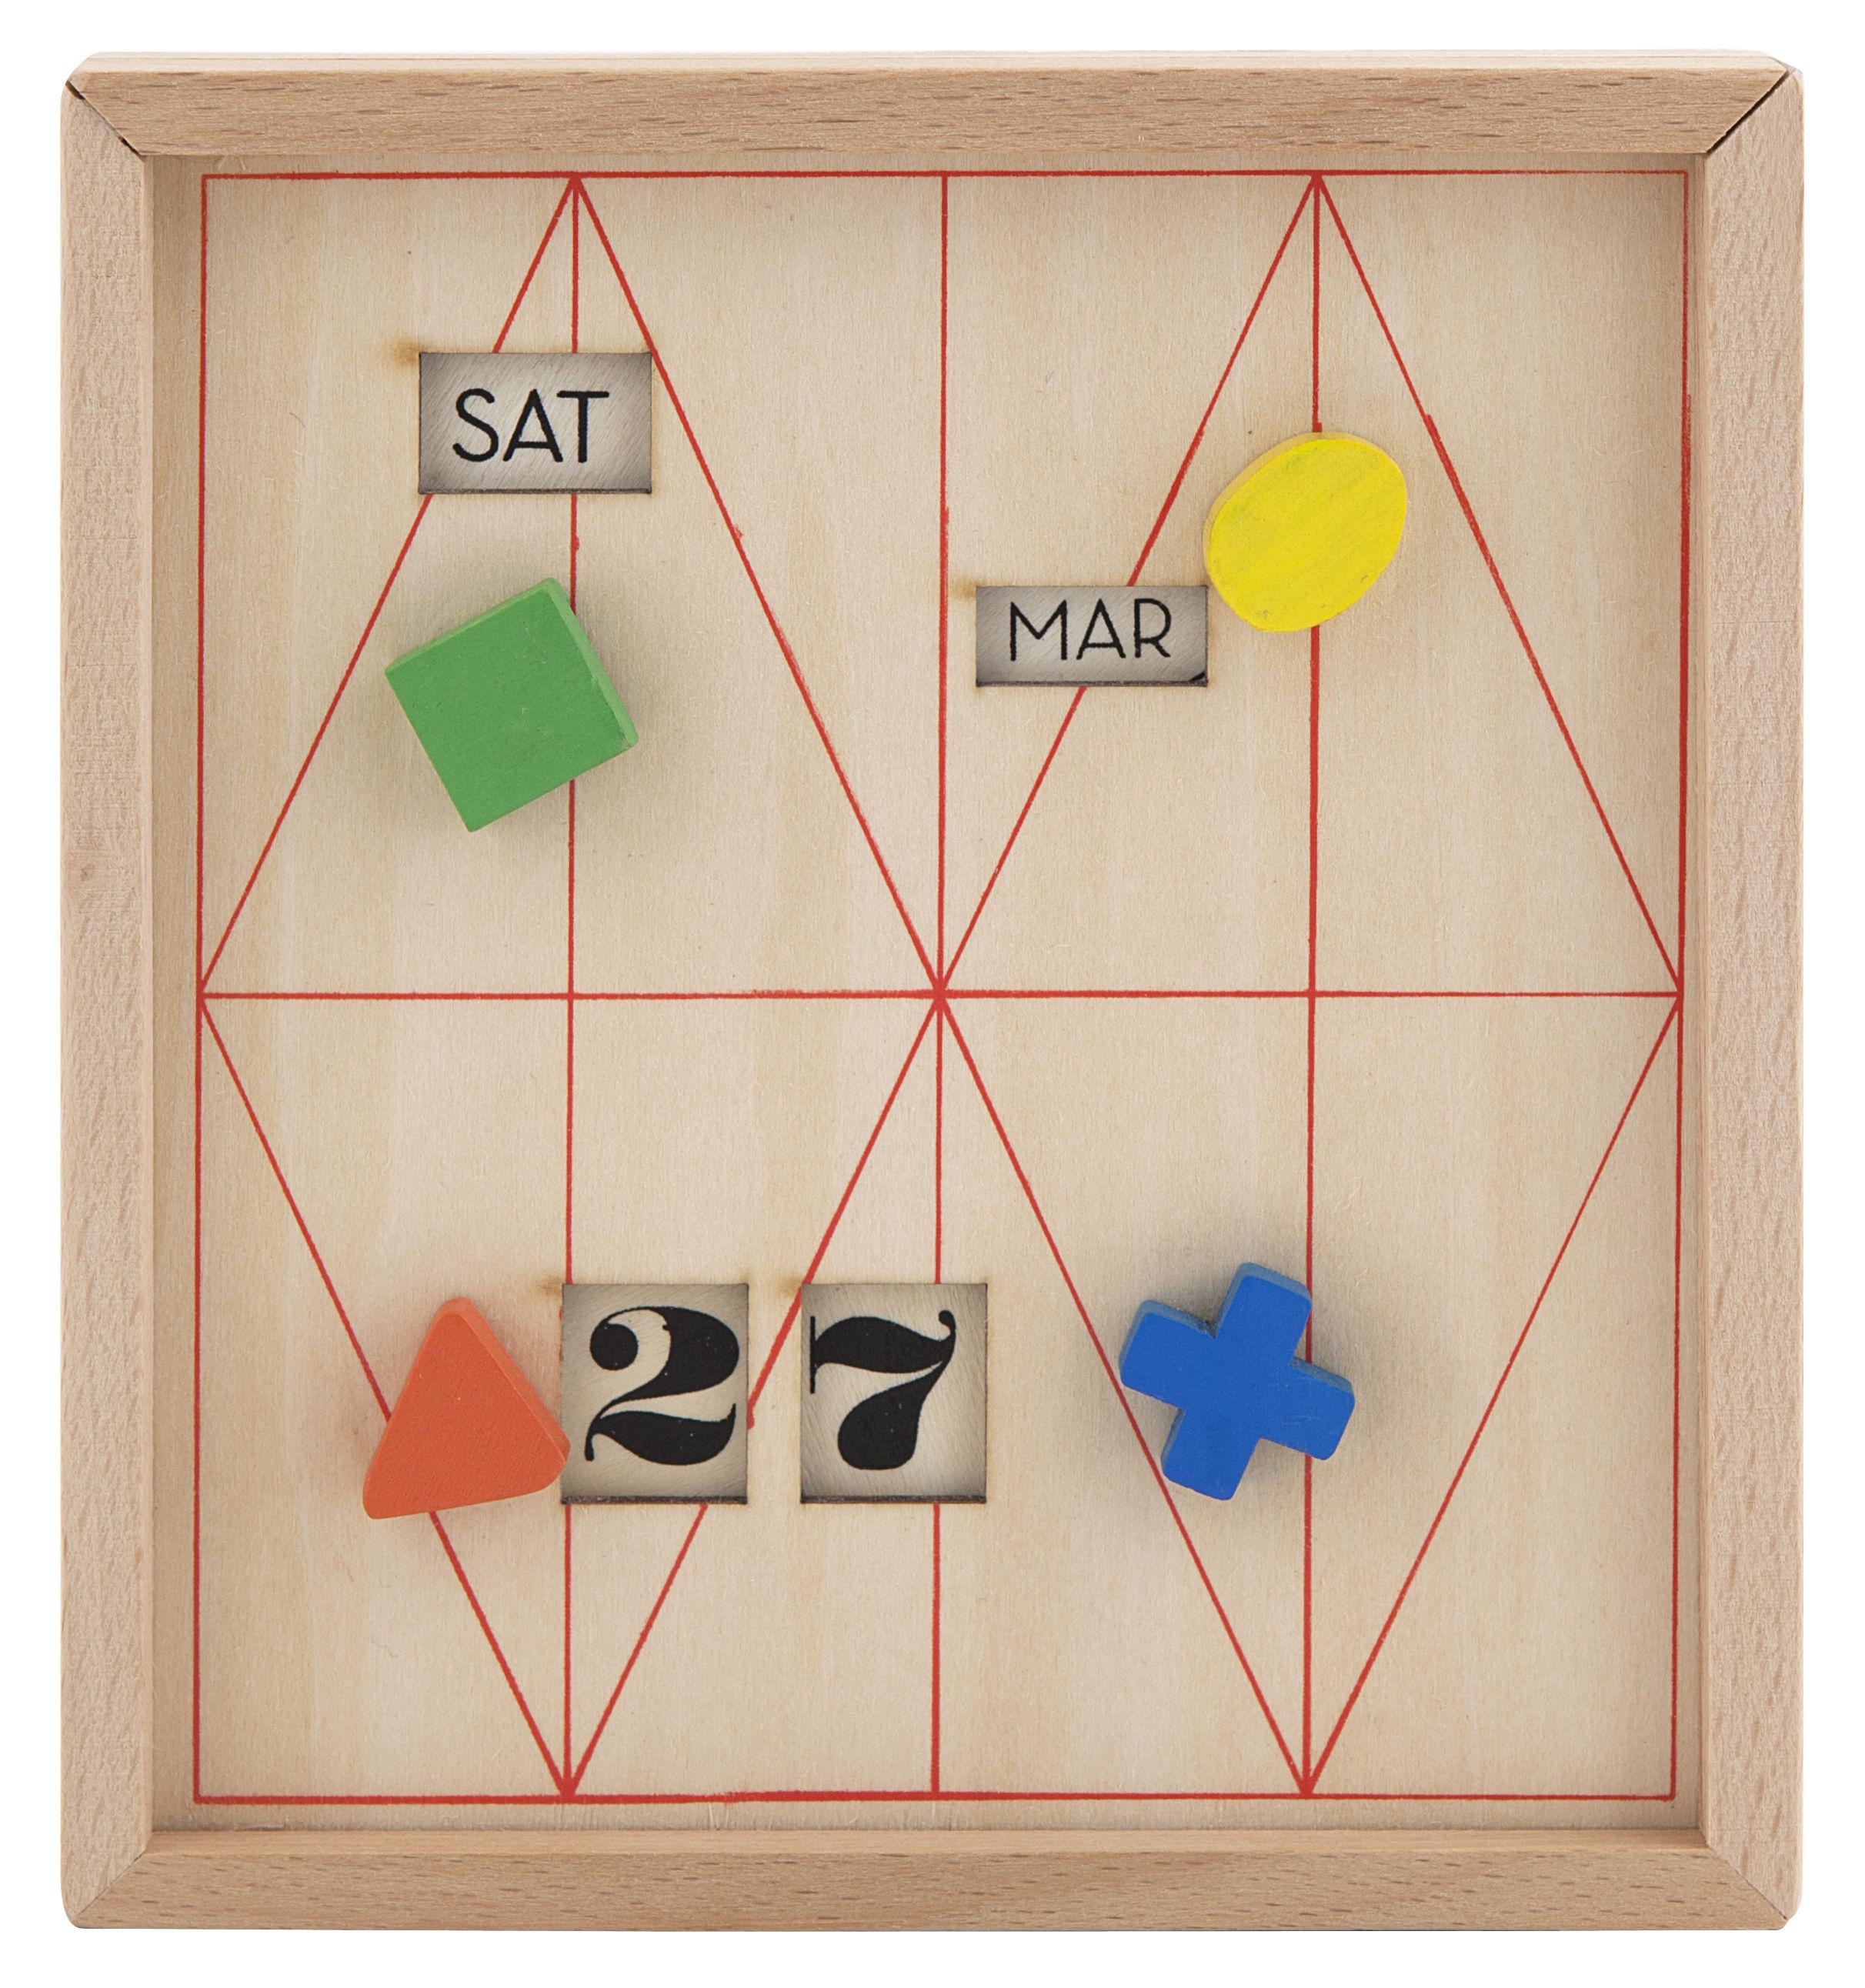 Year Calendar Kikkerland : Perpetual calendar box wood multicolored by kikkerland made